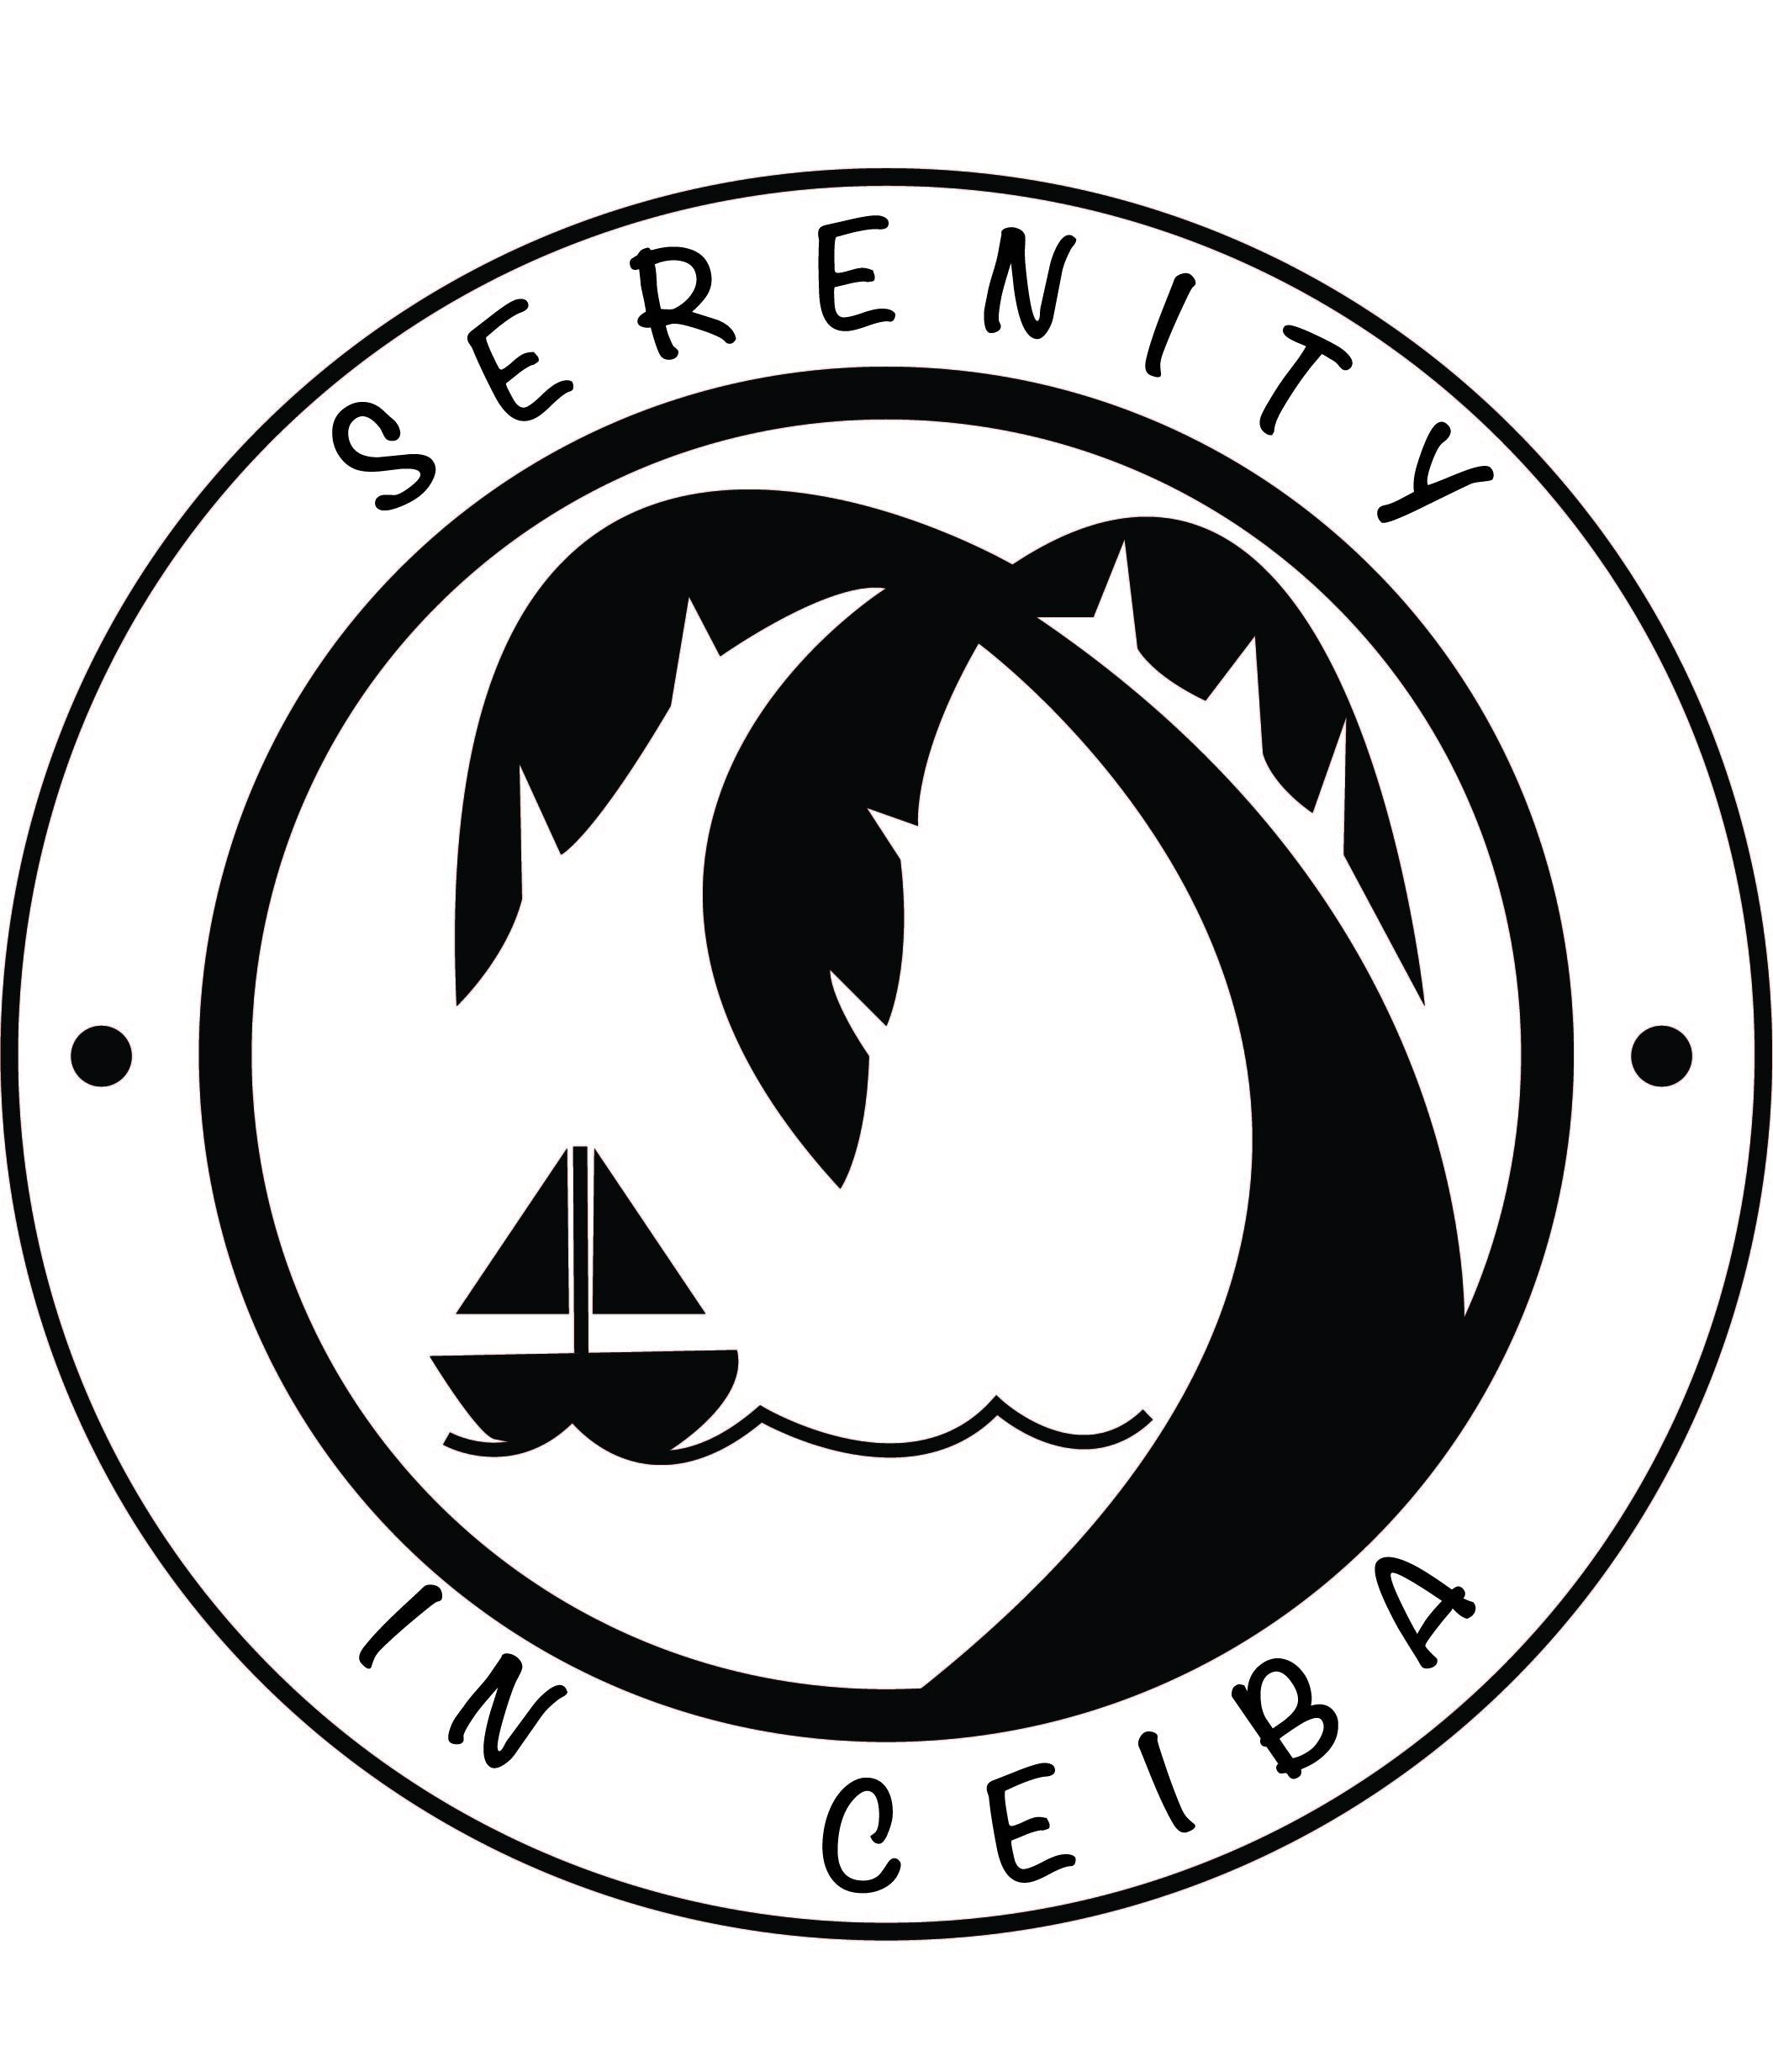 Serenity Tessa Garrard